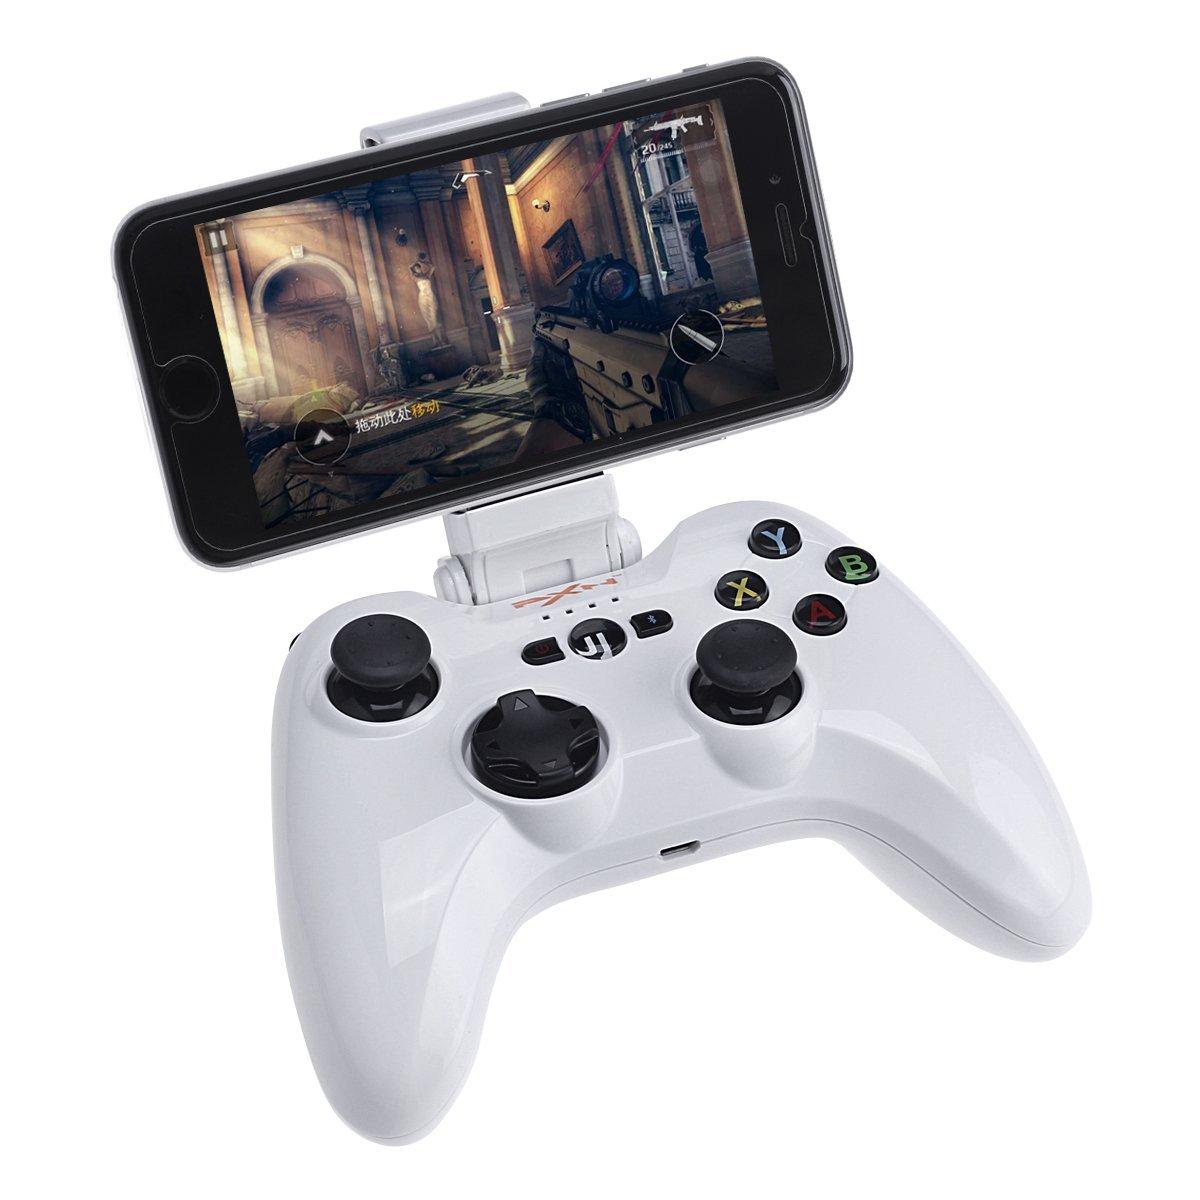 Tay cầm chơi game Megadream Wireless Gaming Joystick